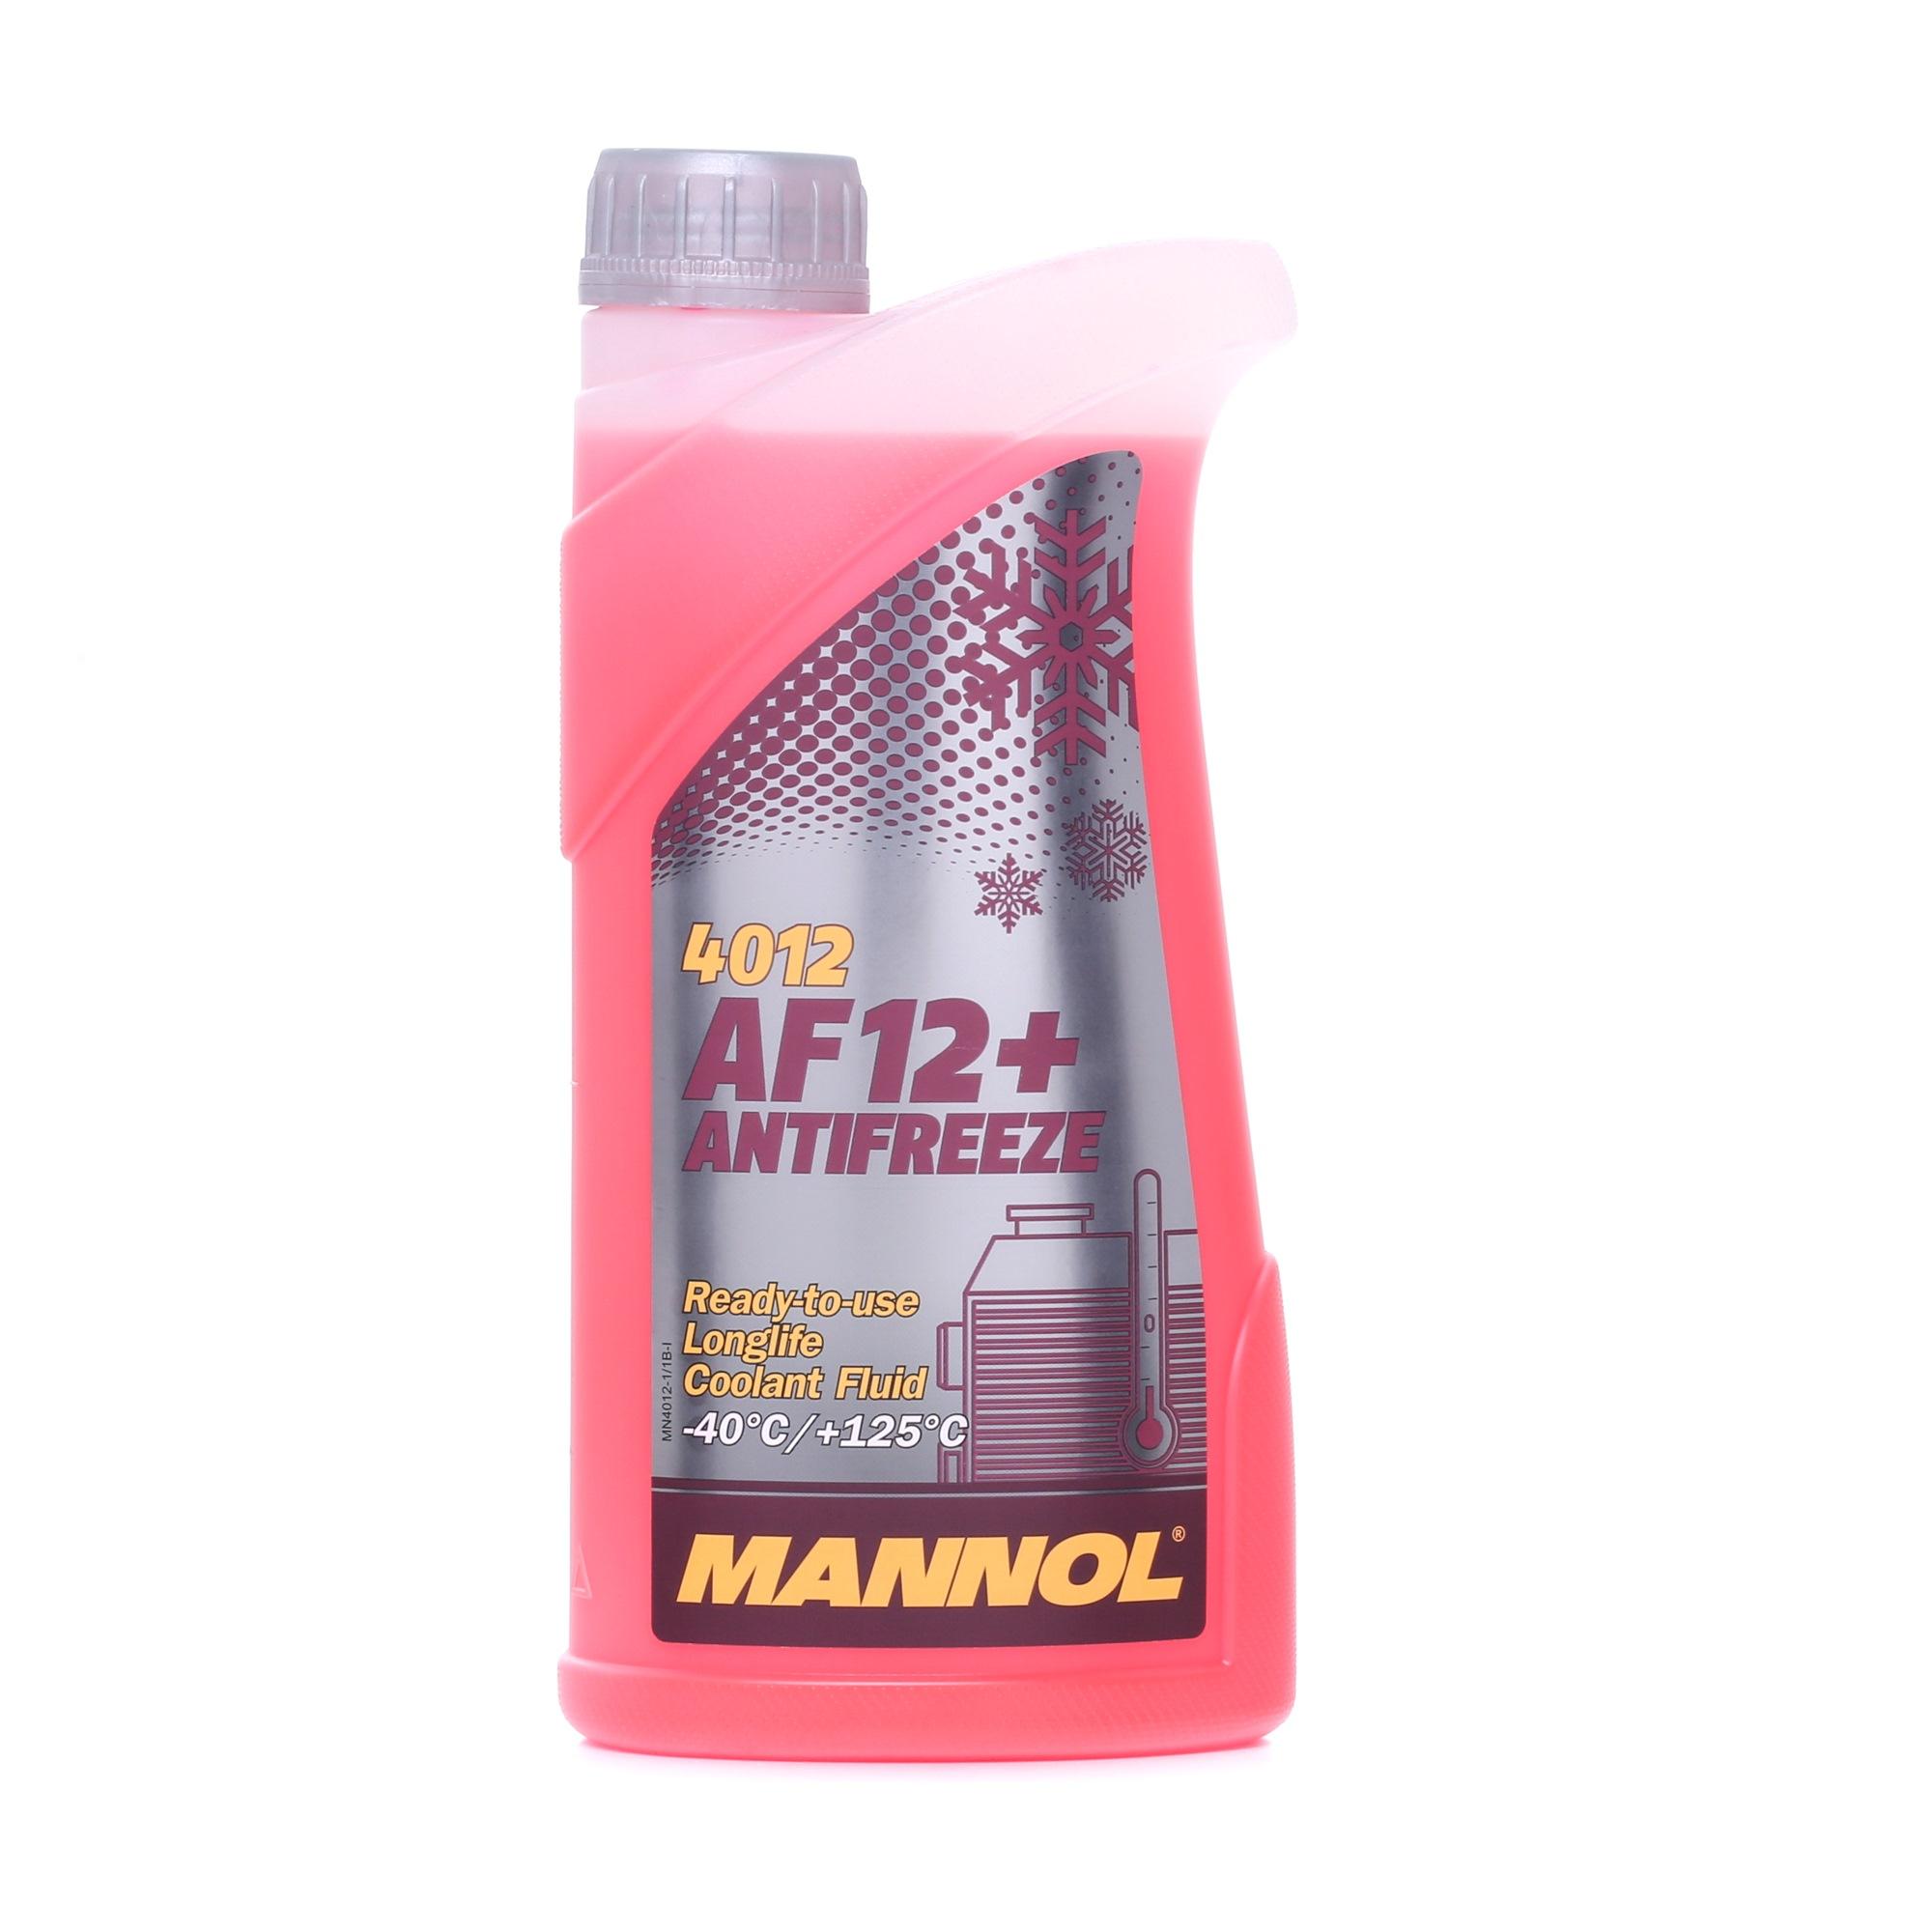 Glycol antifreeze MANNOL MN4012-1 rating